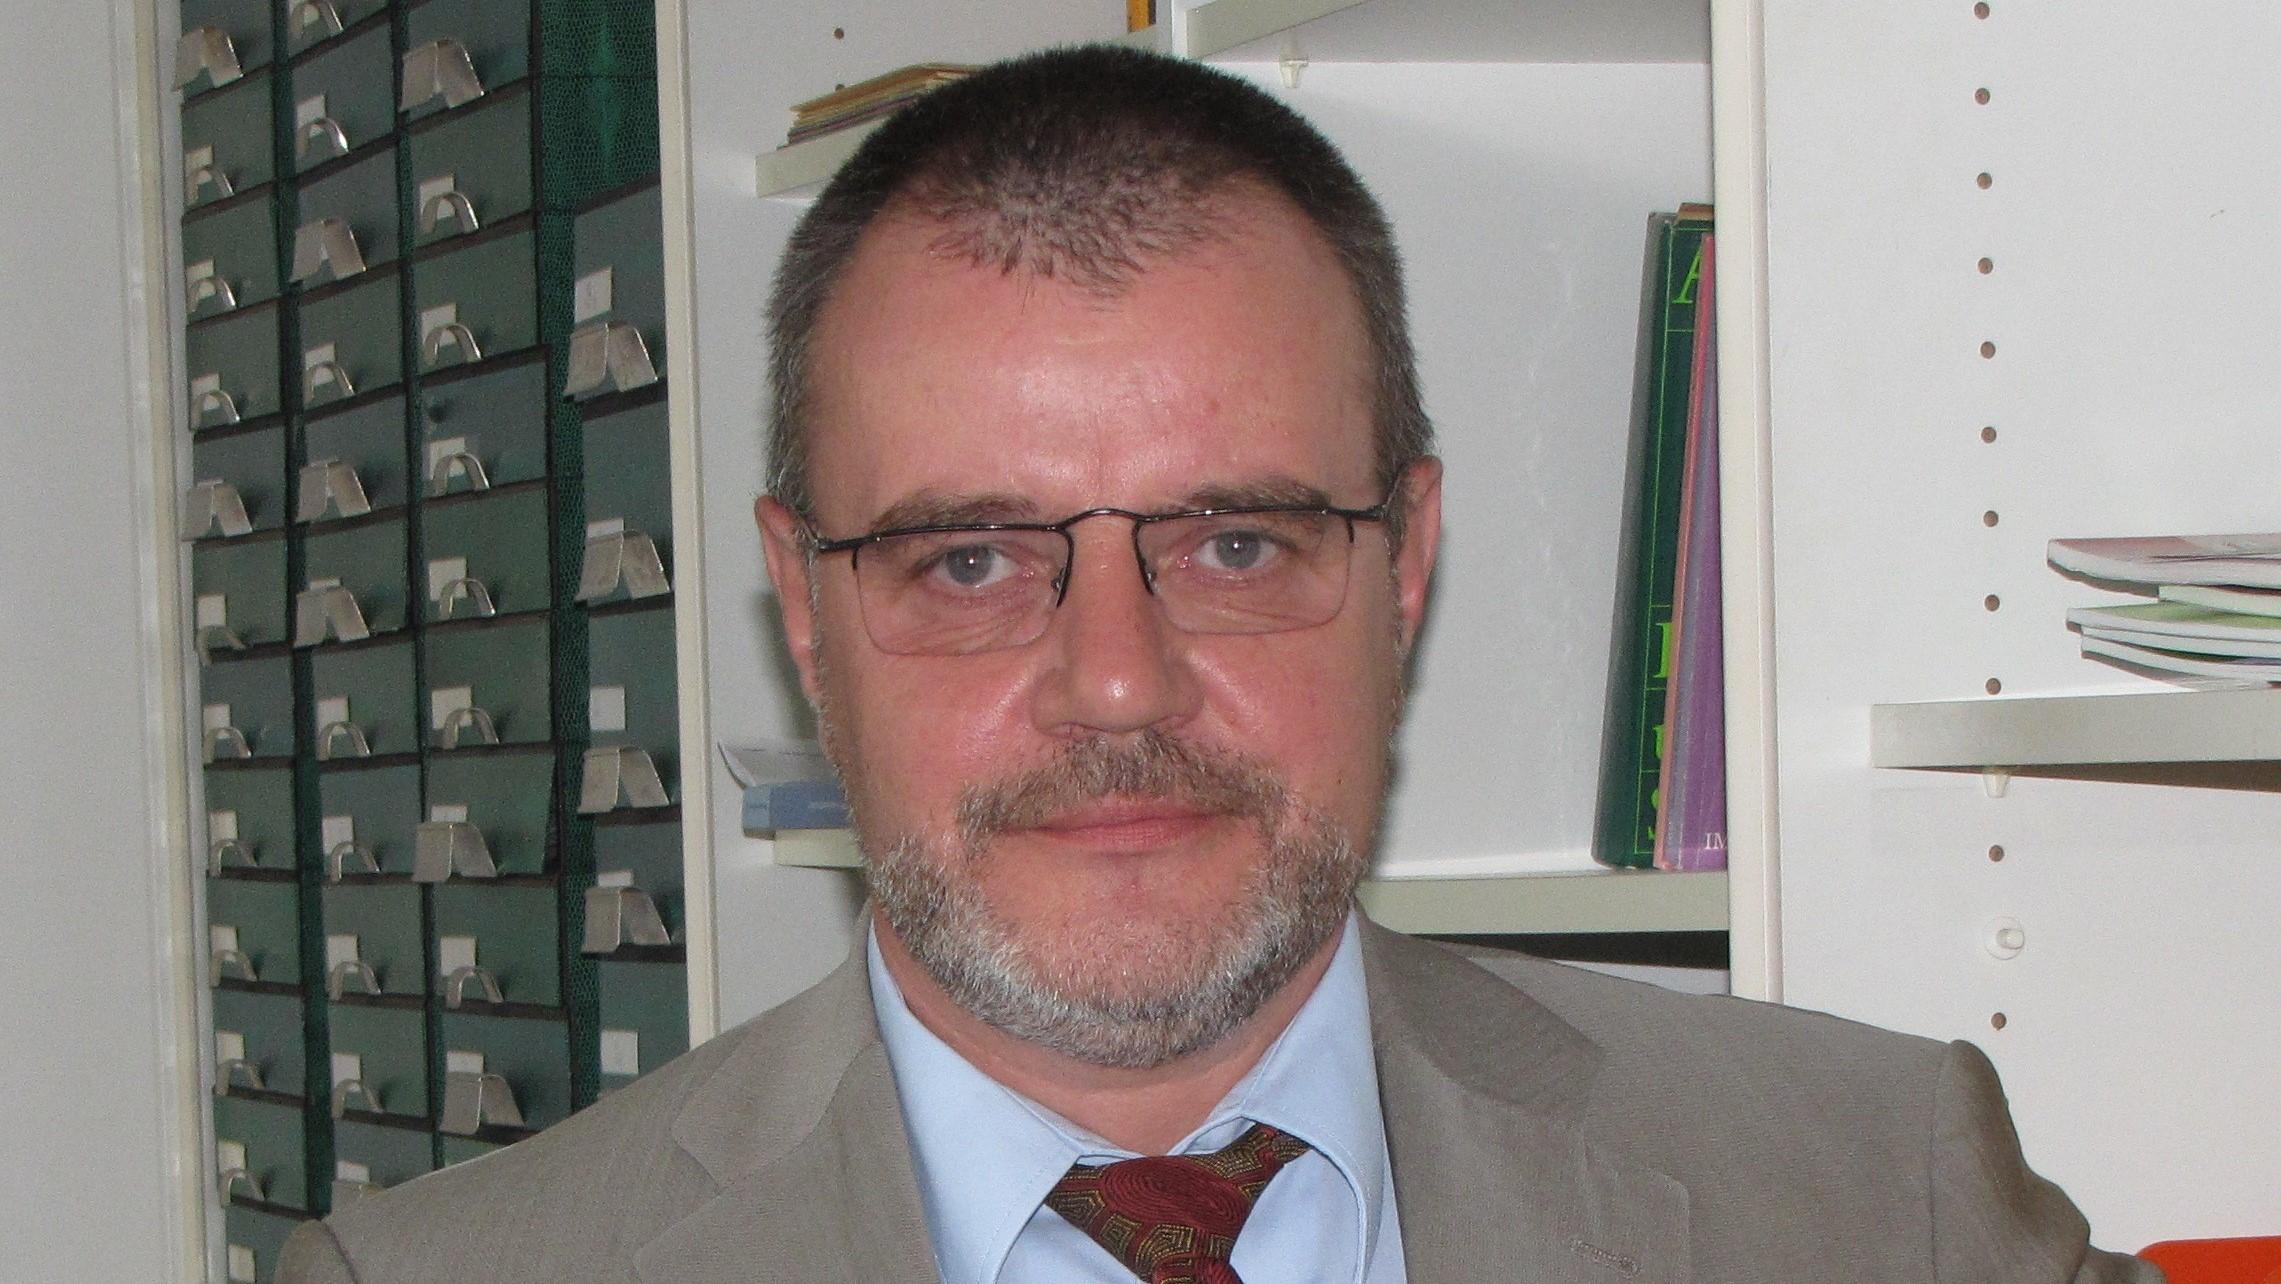 Prof. Dr. Hartmut A.G. Bosinski